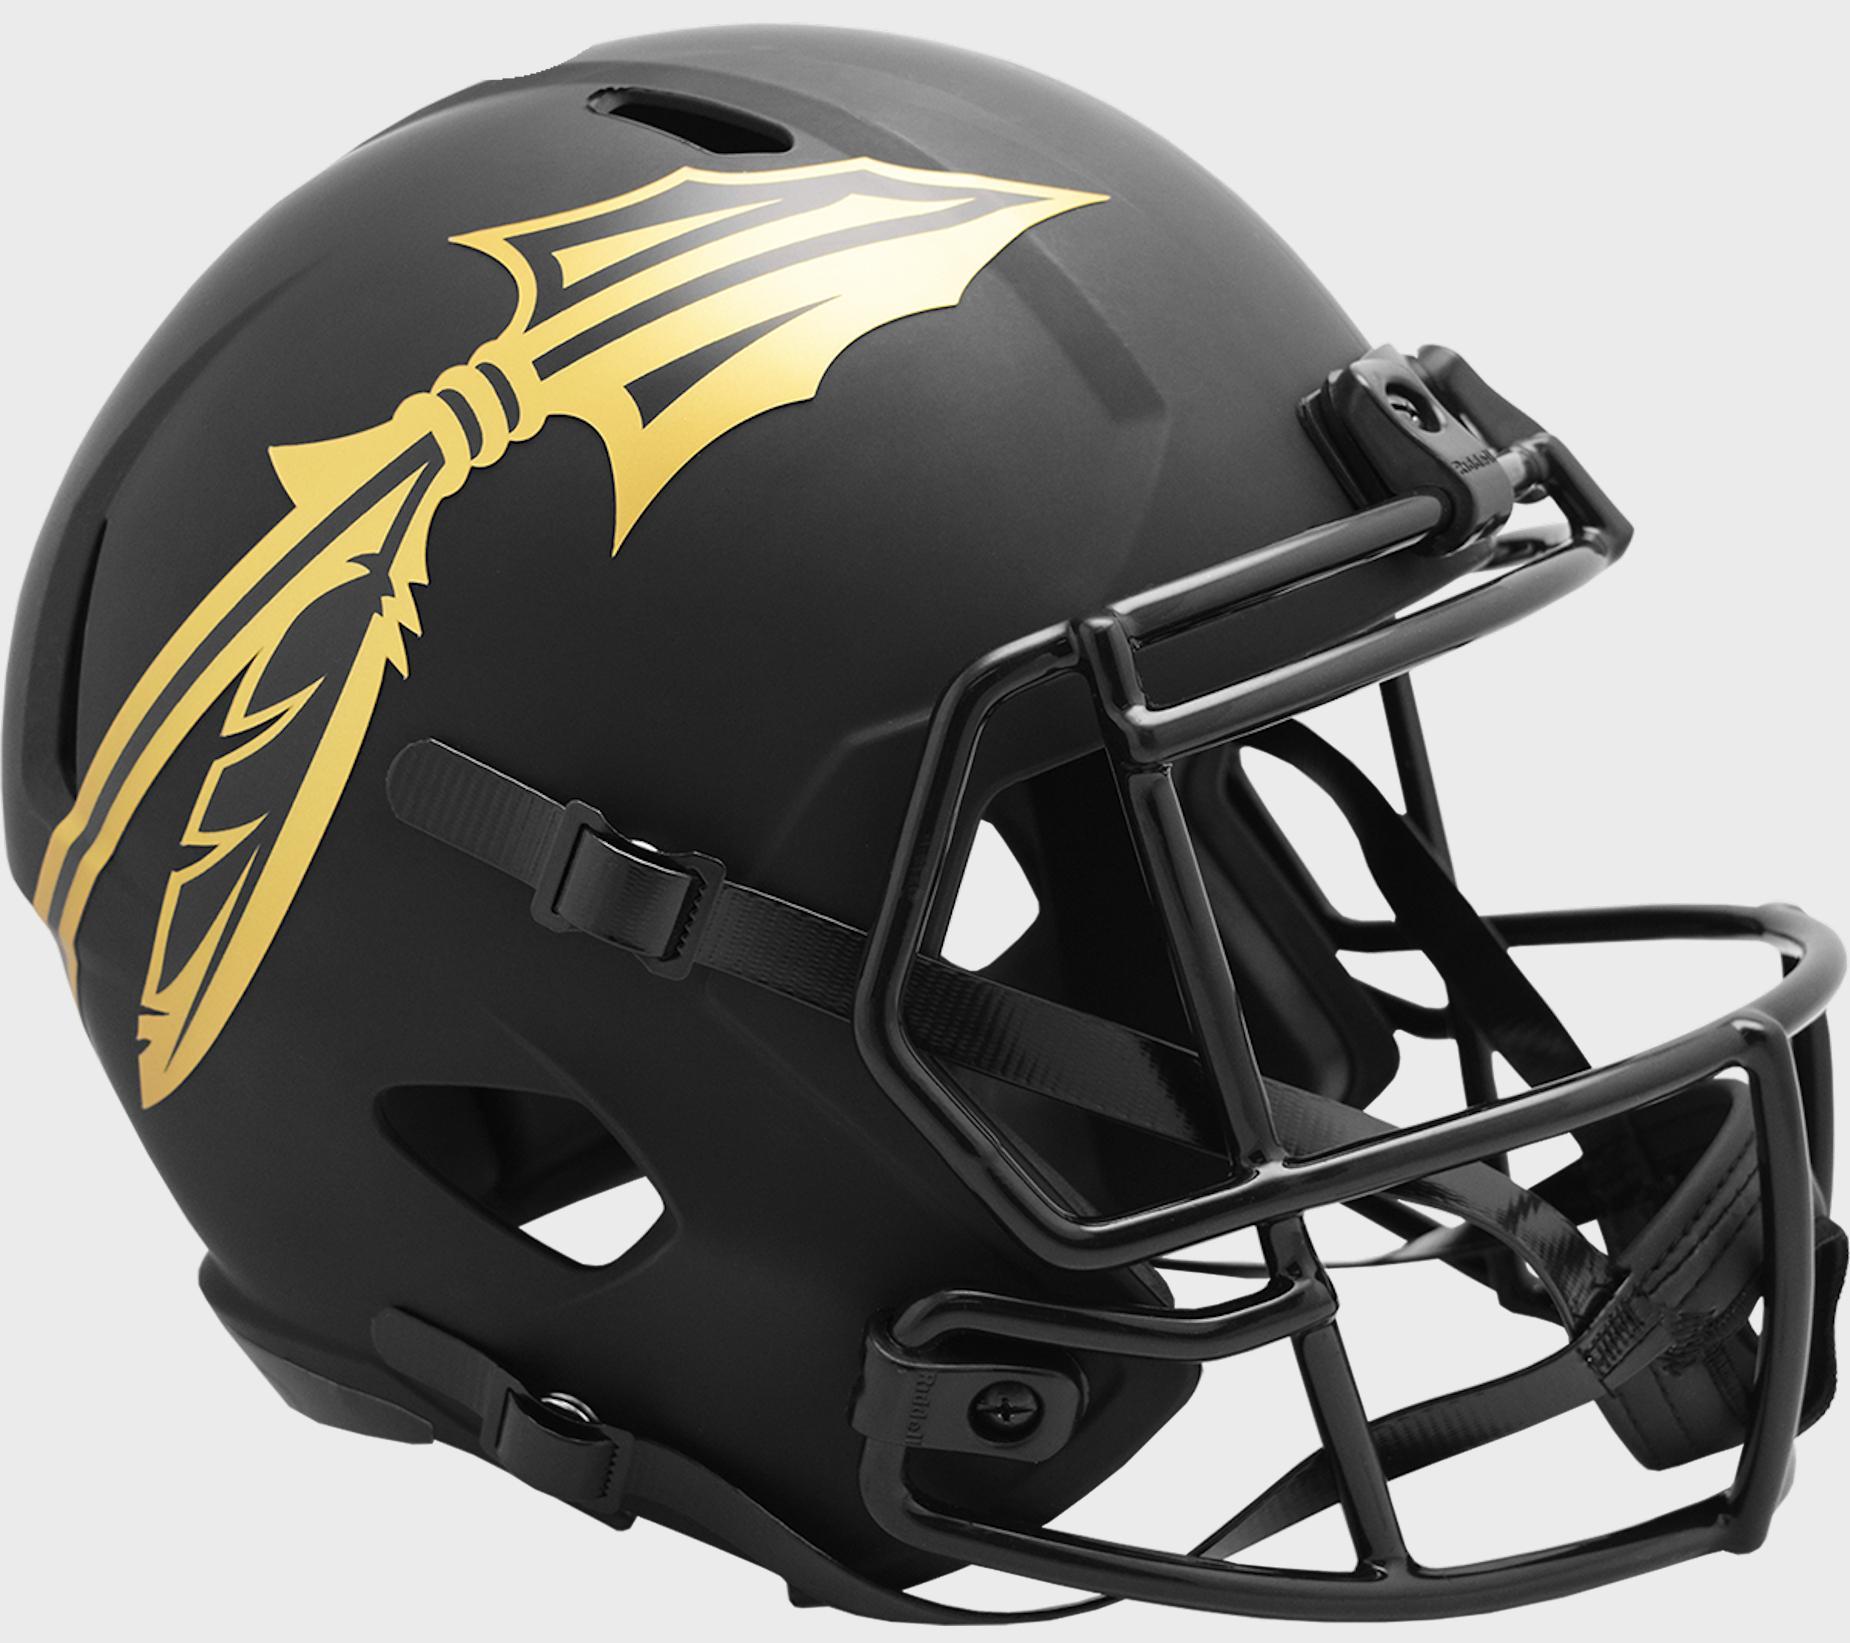 Florida State Seminoles Speed Replica Football Helmet <B>ECLIPSE </B>